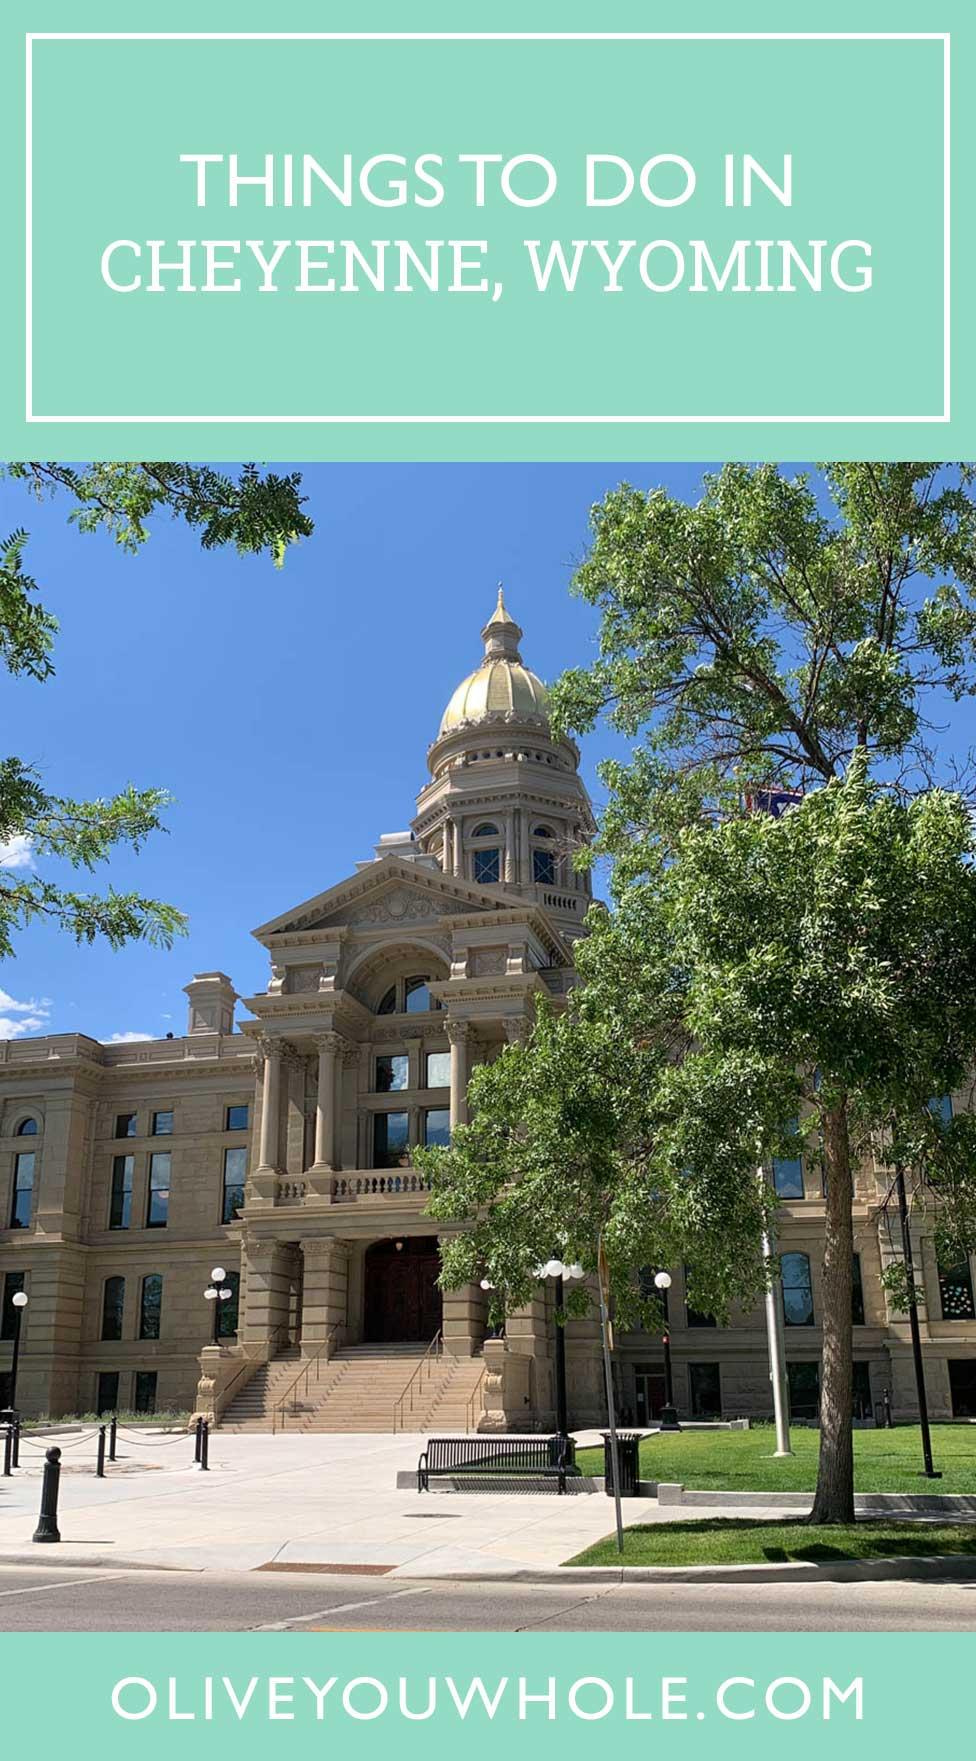 Things to do in Cheyenne Wyoming Pinterest